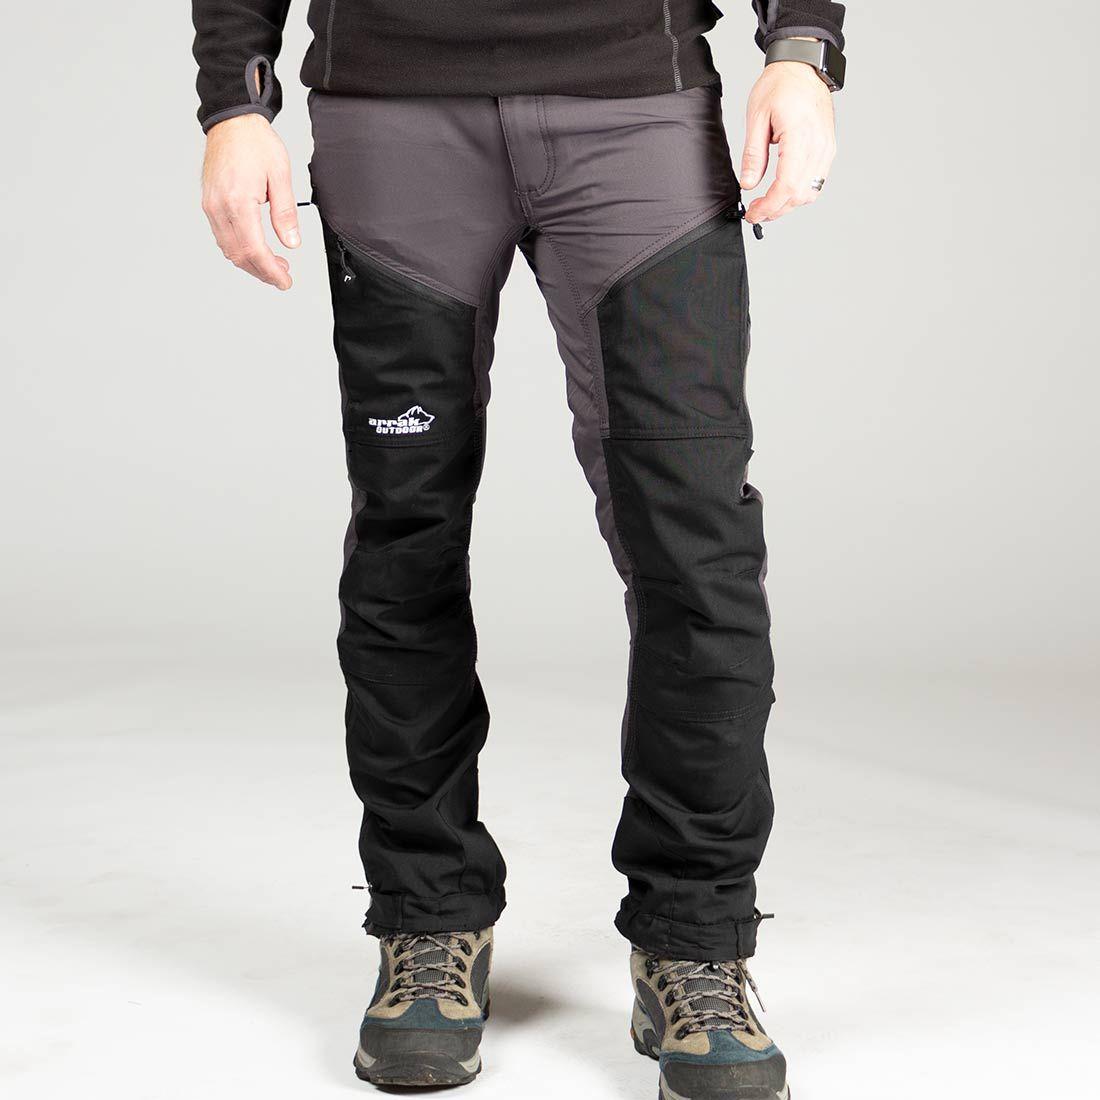 Arrak Rough Pant, Dark Grey 50